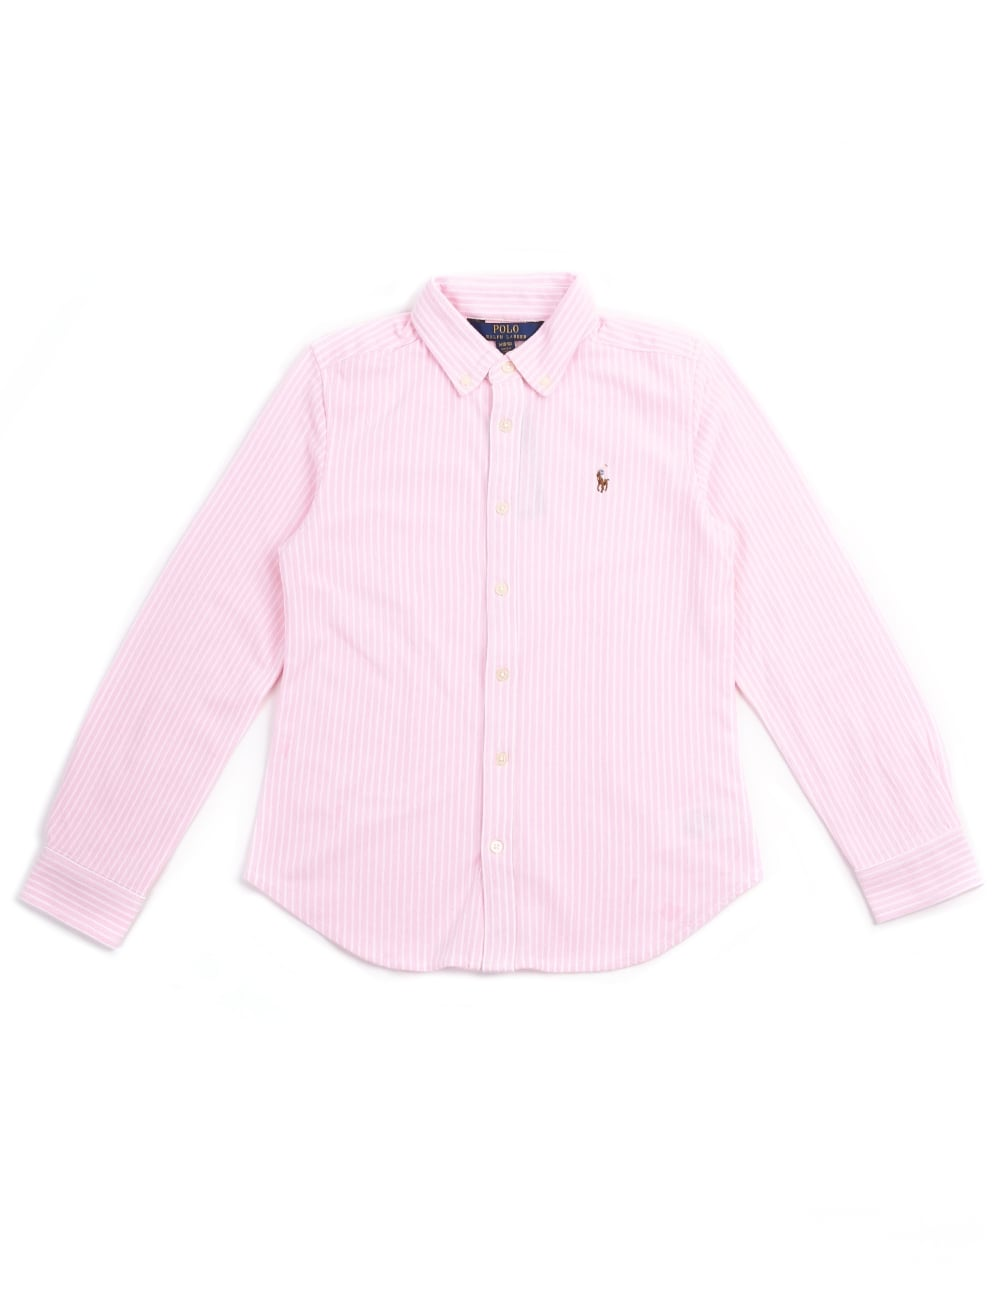 Polo Ralph Lauren Youth Girls Striped Long Sleeve Shirt 907772132